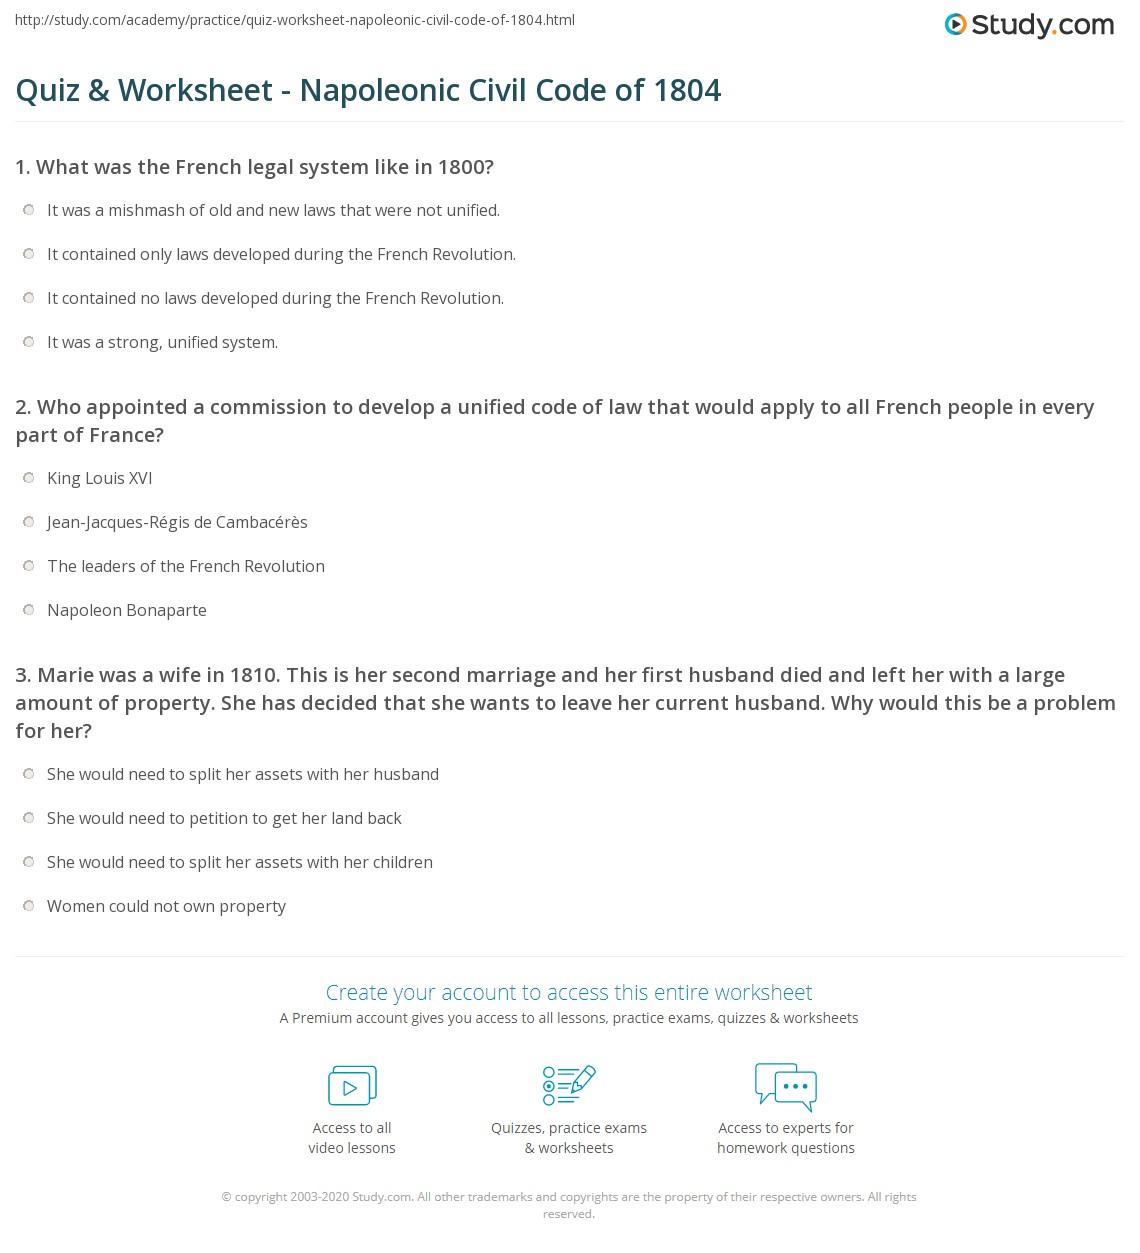 quiz worksheet napoleonic civil code of 1804. Black Bedroom Furniture Sets. Home Design Ideas